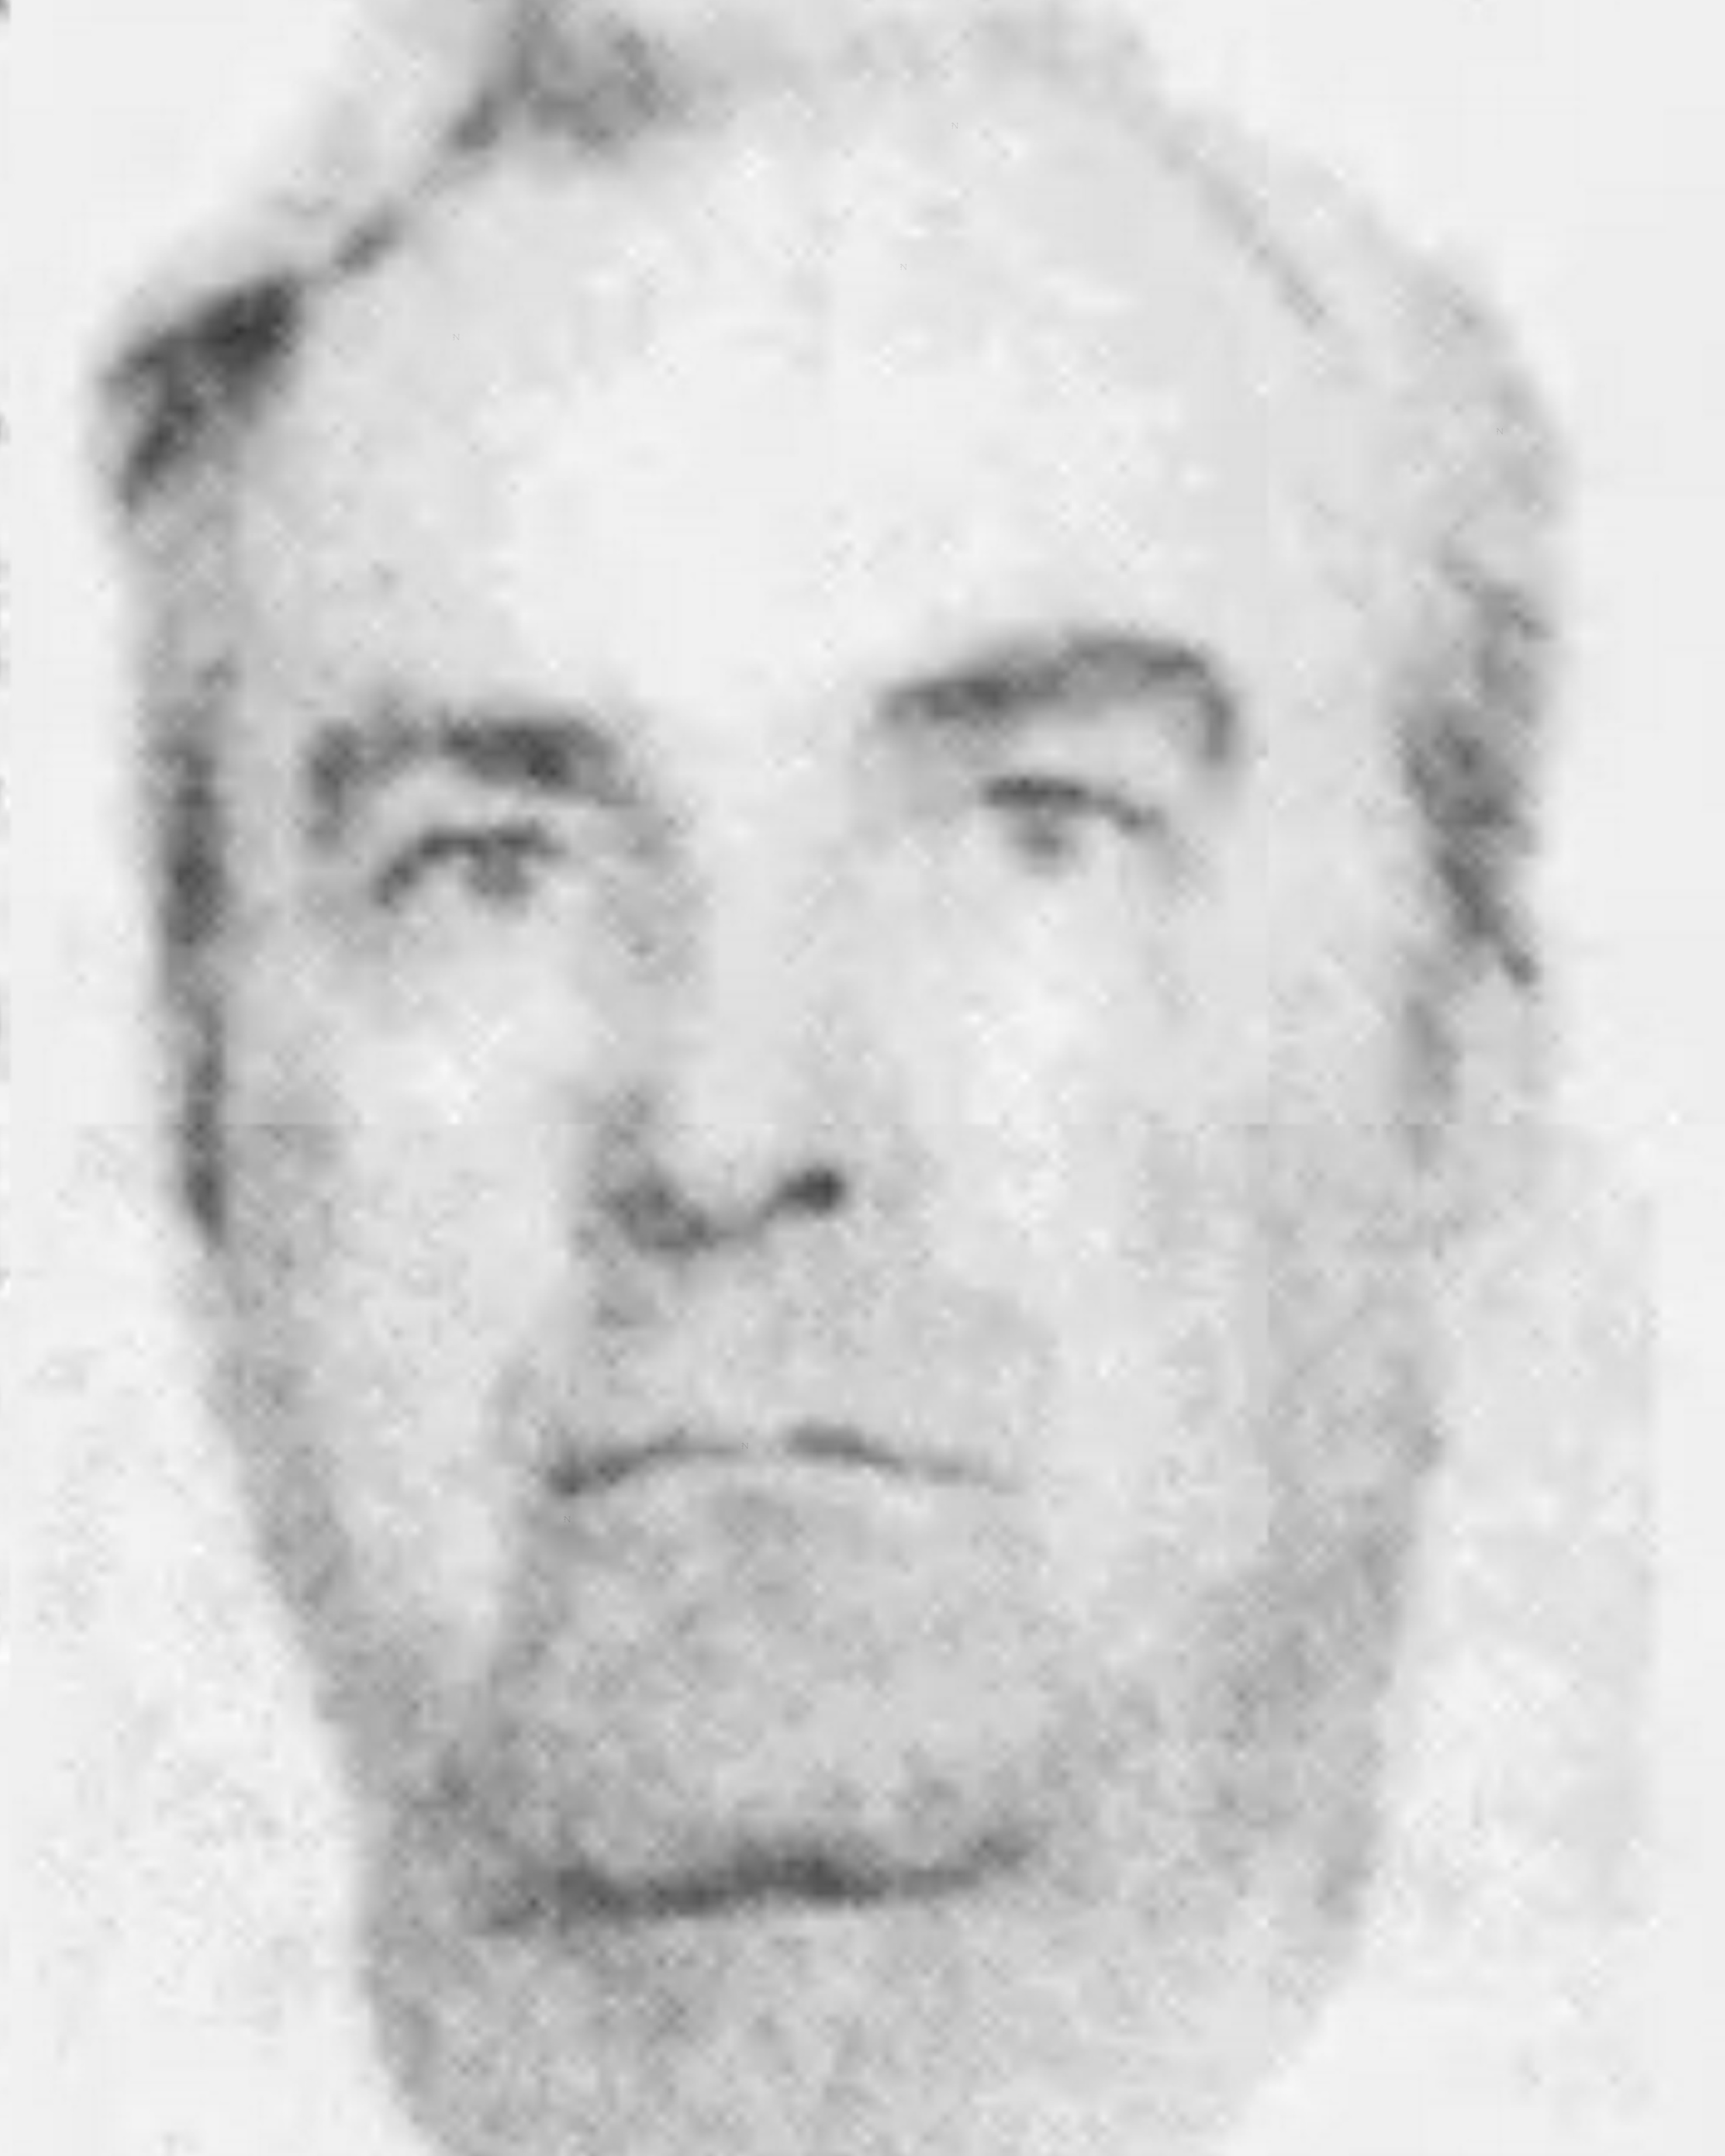 Deputy Chief William J. McGuirk | Essex County Sheriff's Office, New Jersey